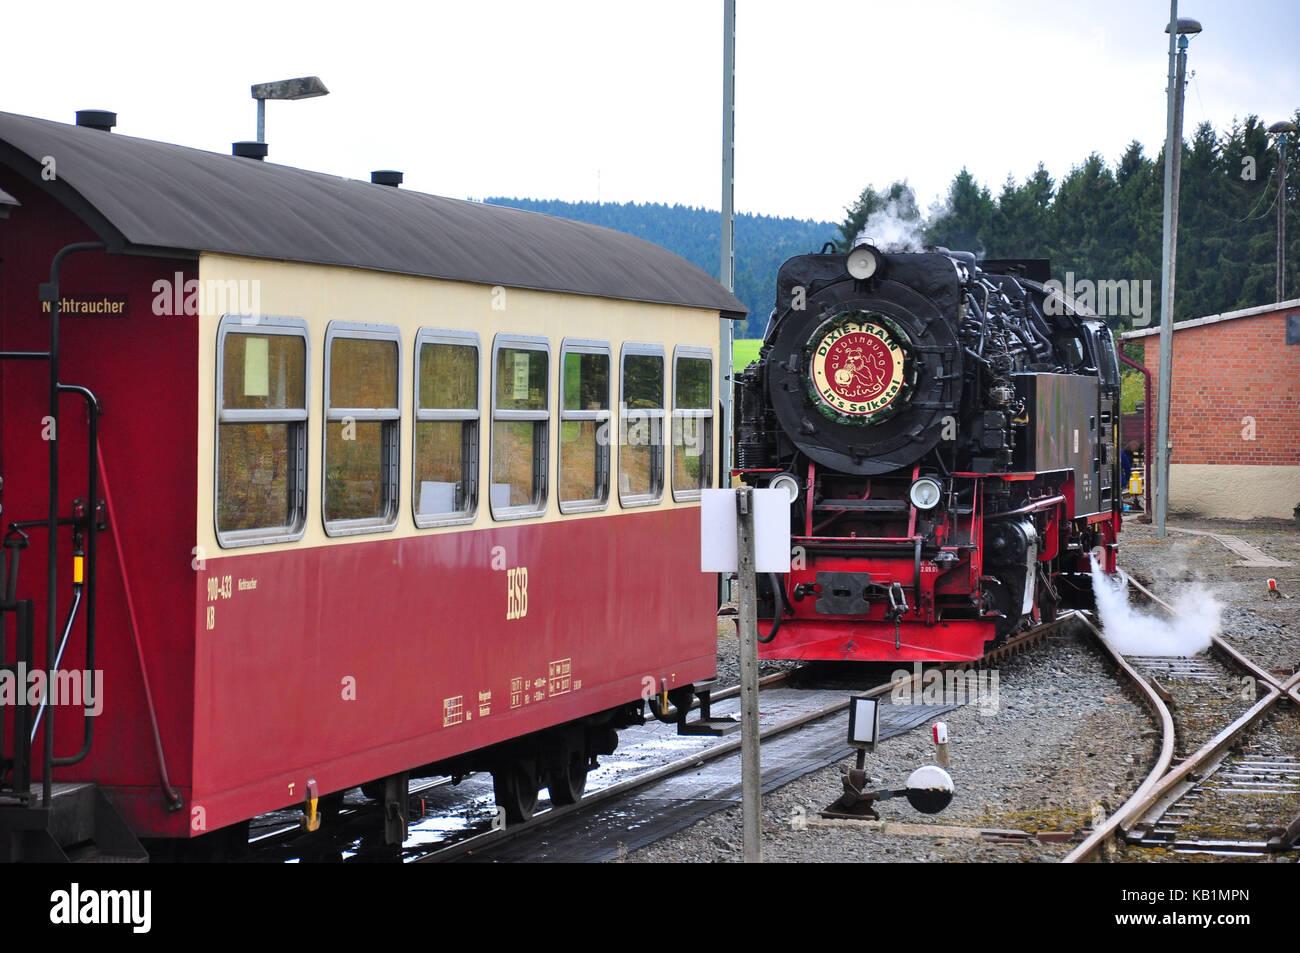 Germany, Saxony-Anhalt, east resin, Harzer light railway, Brocken-Dixie, vapour train, transform, - Stock Image